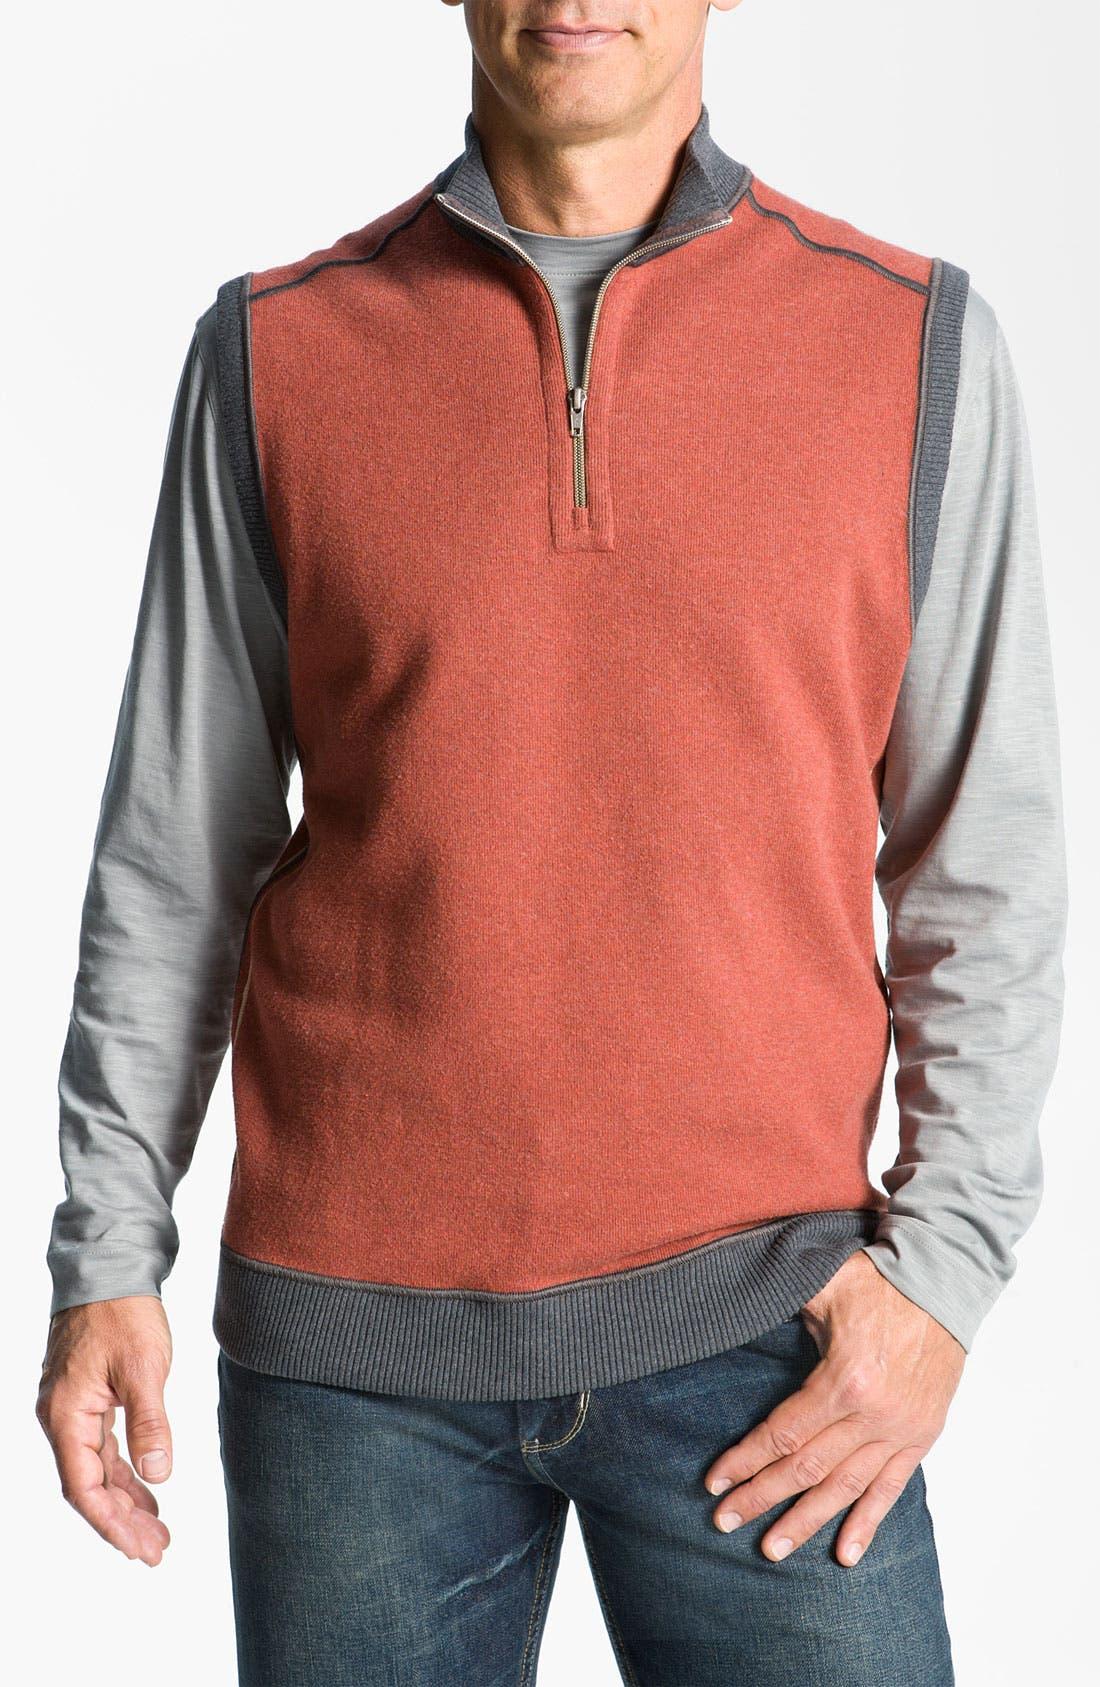 Main Image - Cutter & Buck 'Essex' Reversible Half Zip Vest (Big & Tall)